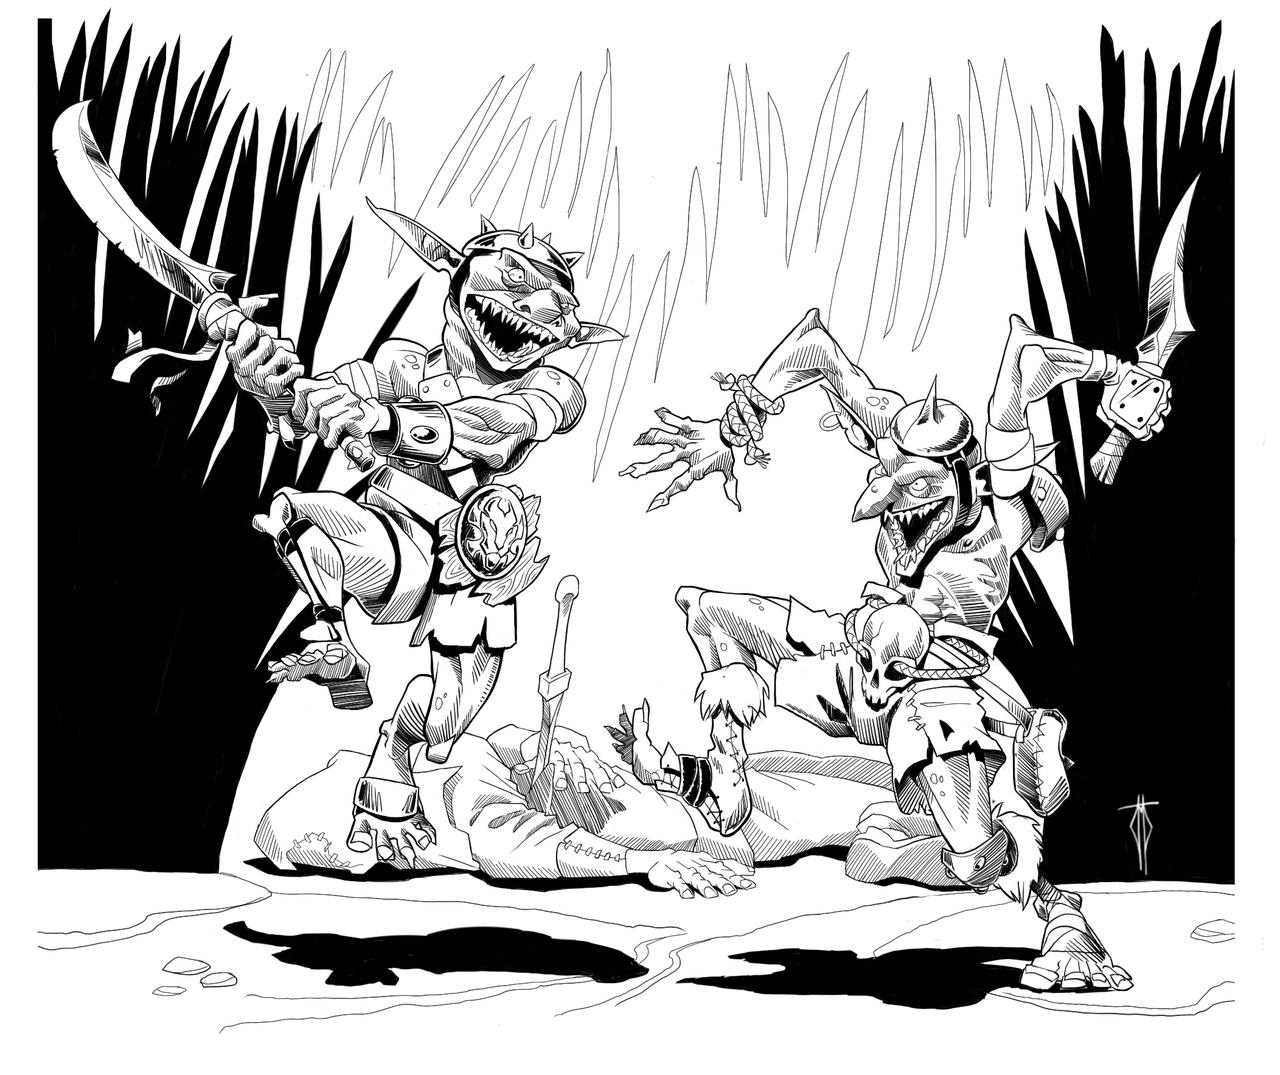 Goblin Squabble